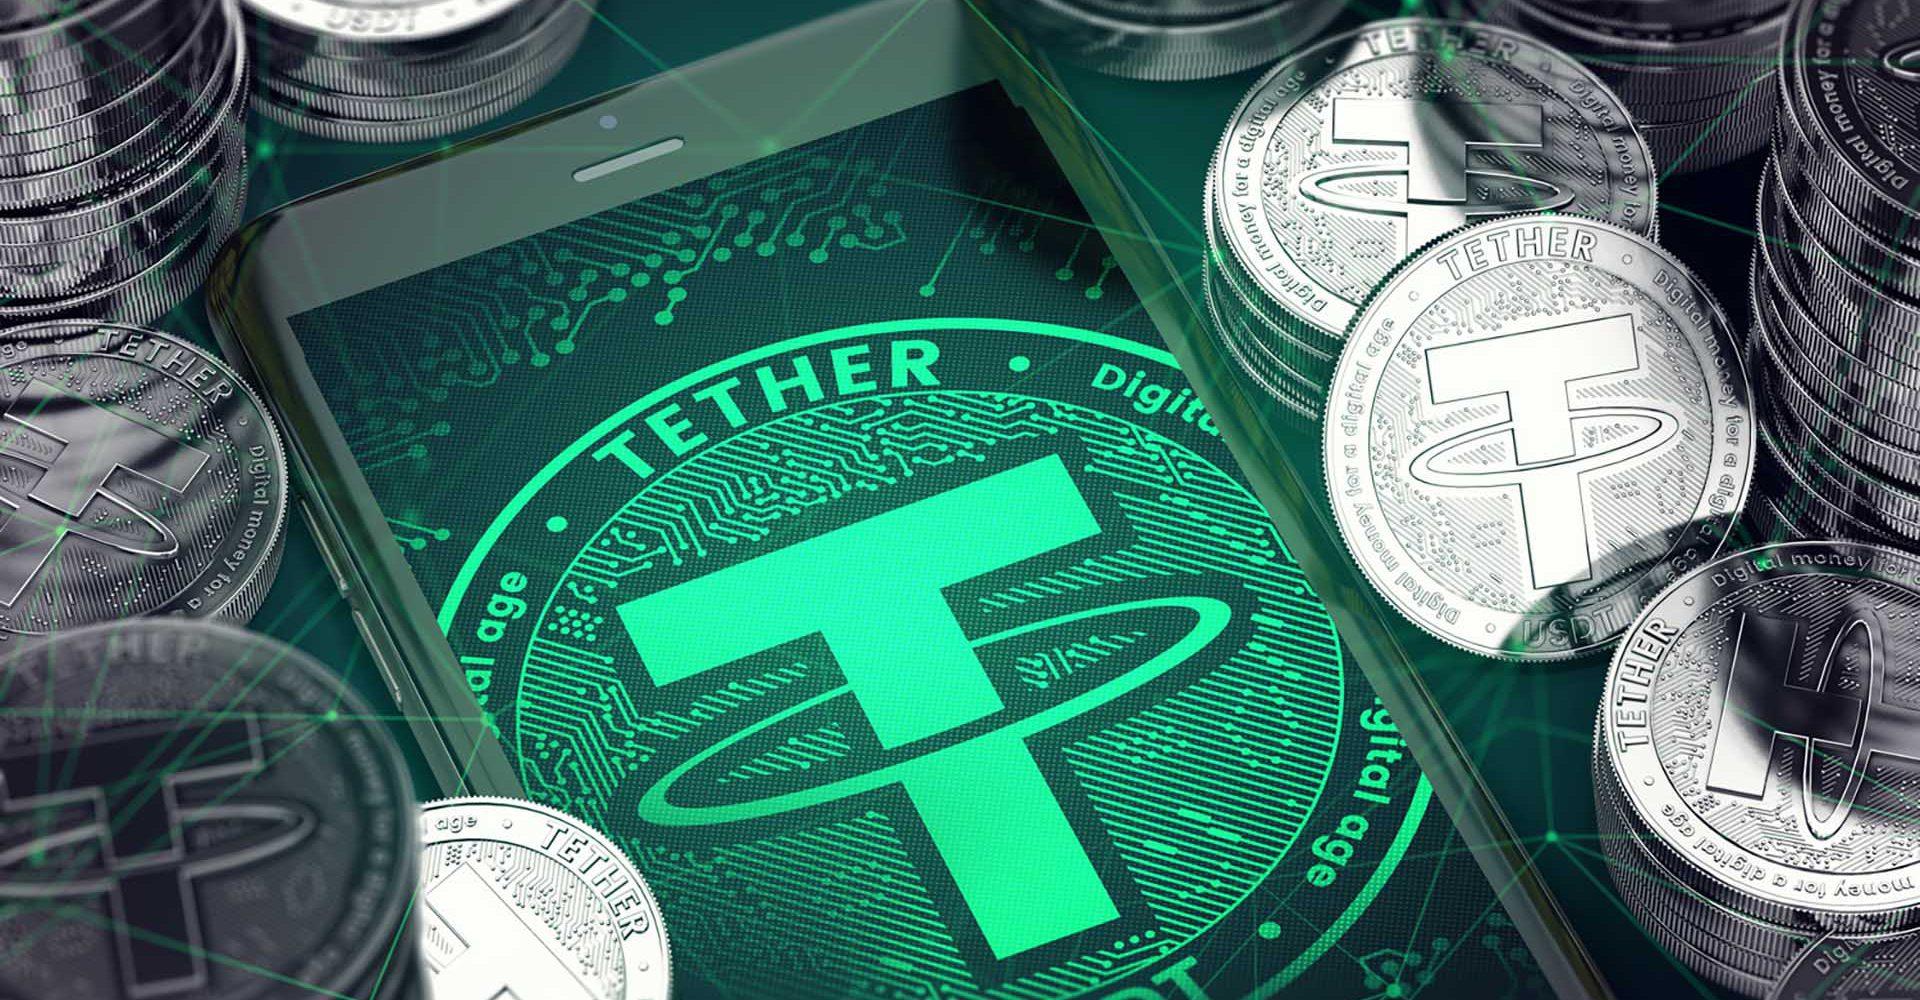 ss tether 1920x1000 - معرفی ارز دیجیتال تتر (Tether) و روش خرید آن